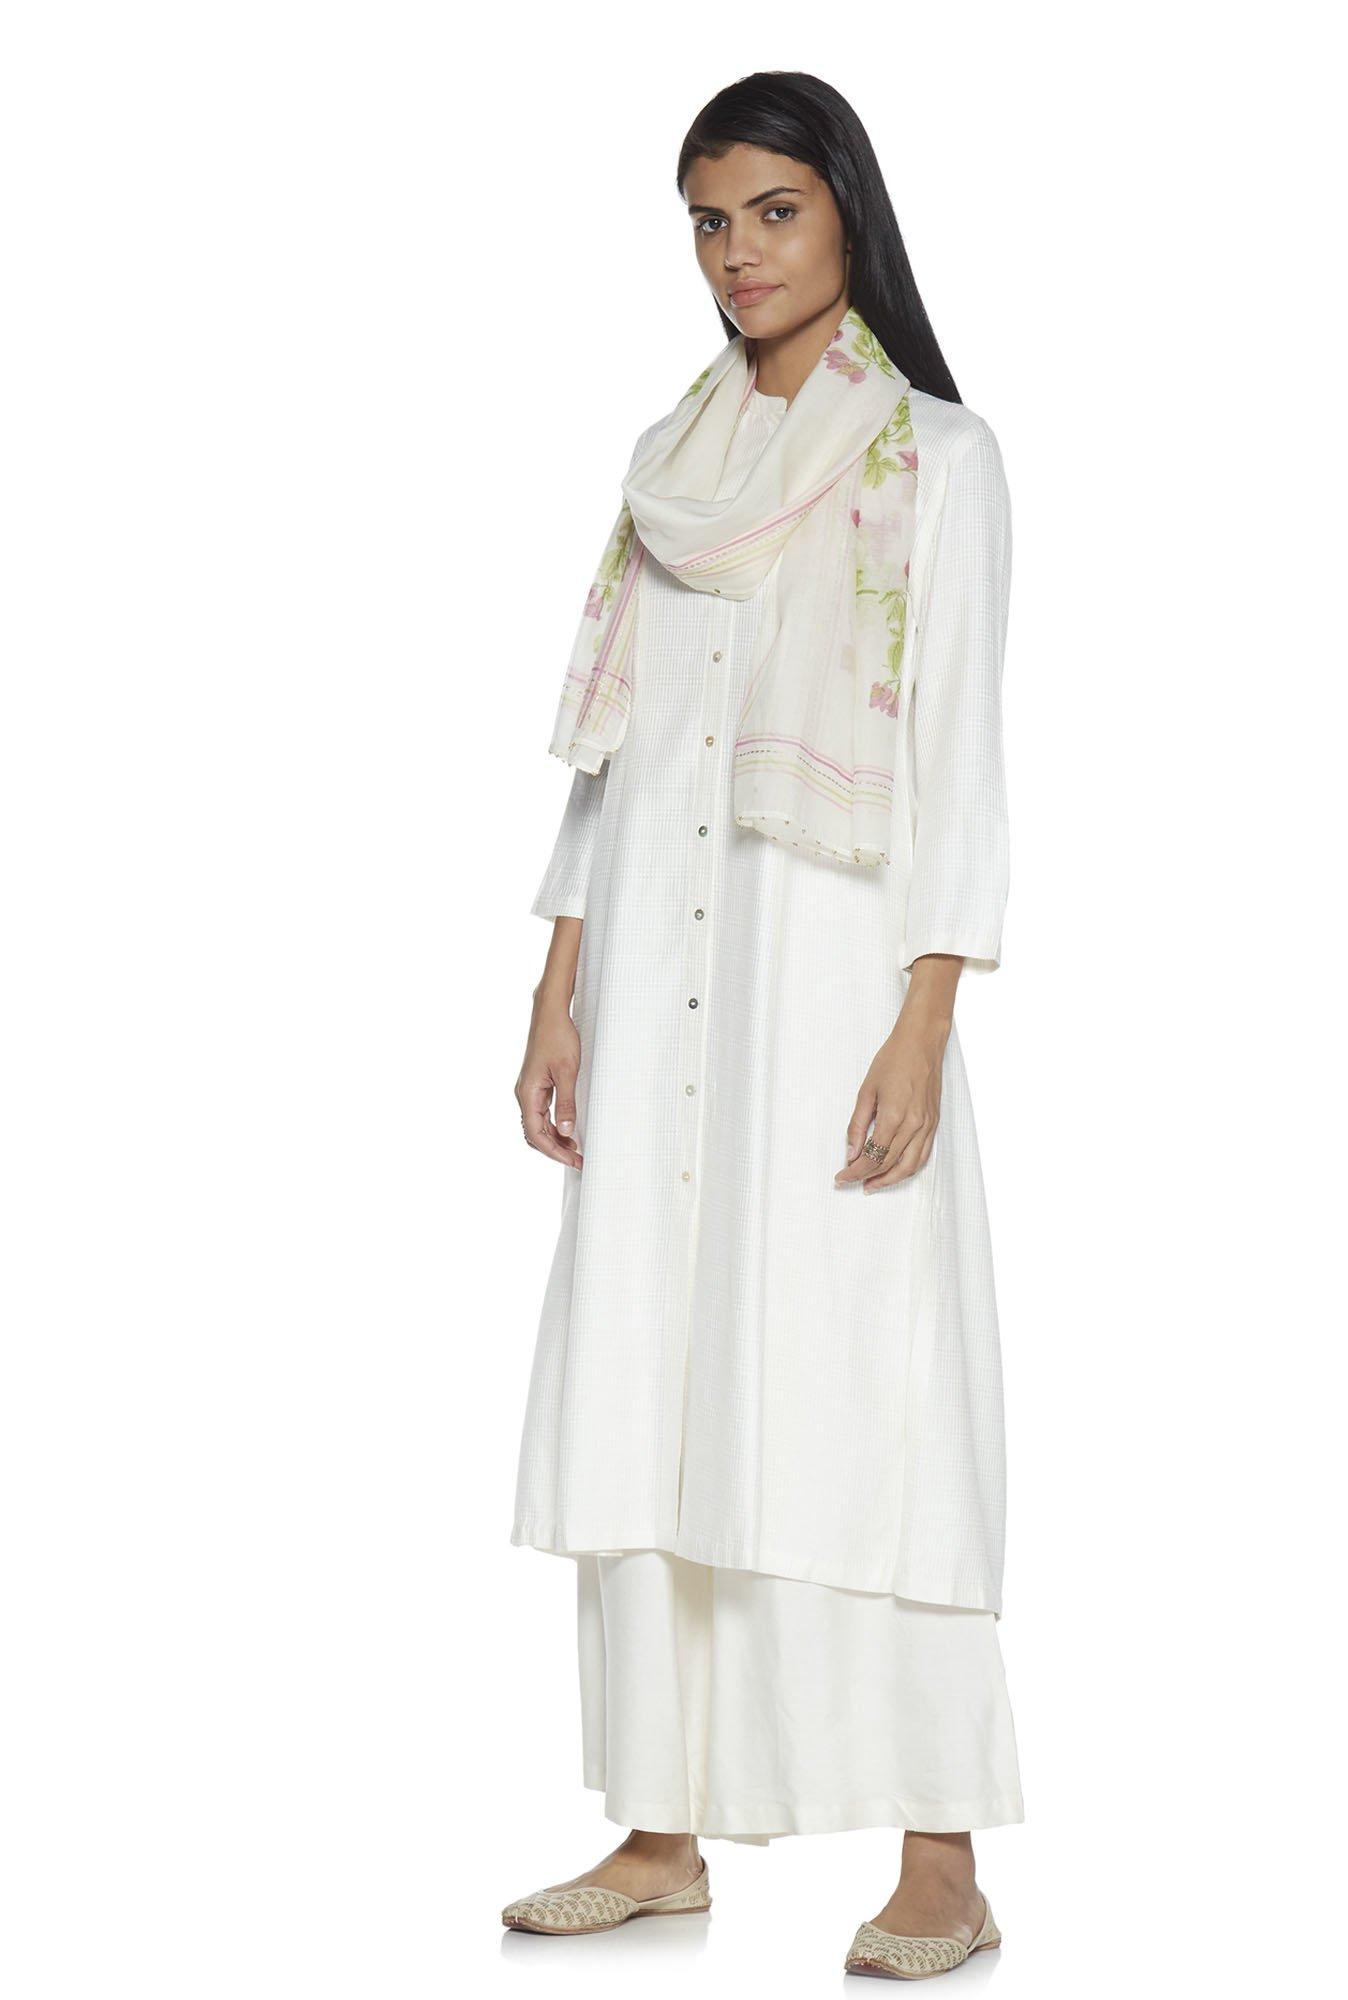 Zuba by Westside White Floral Print Cotton-Silk Stole